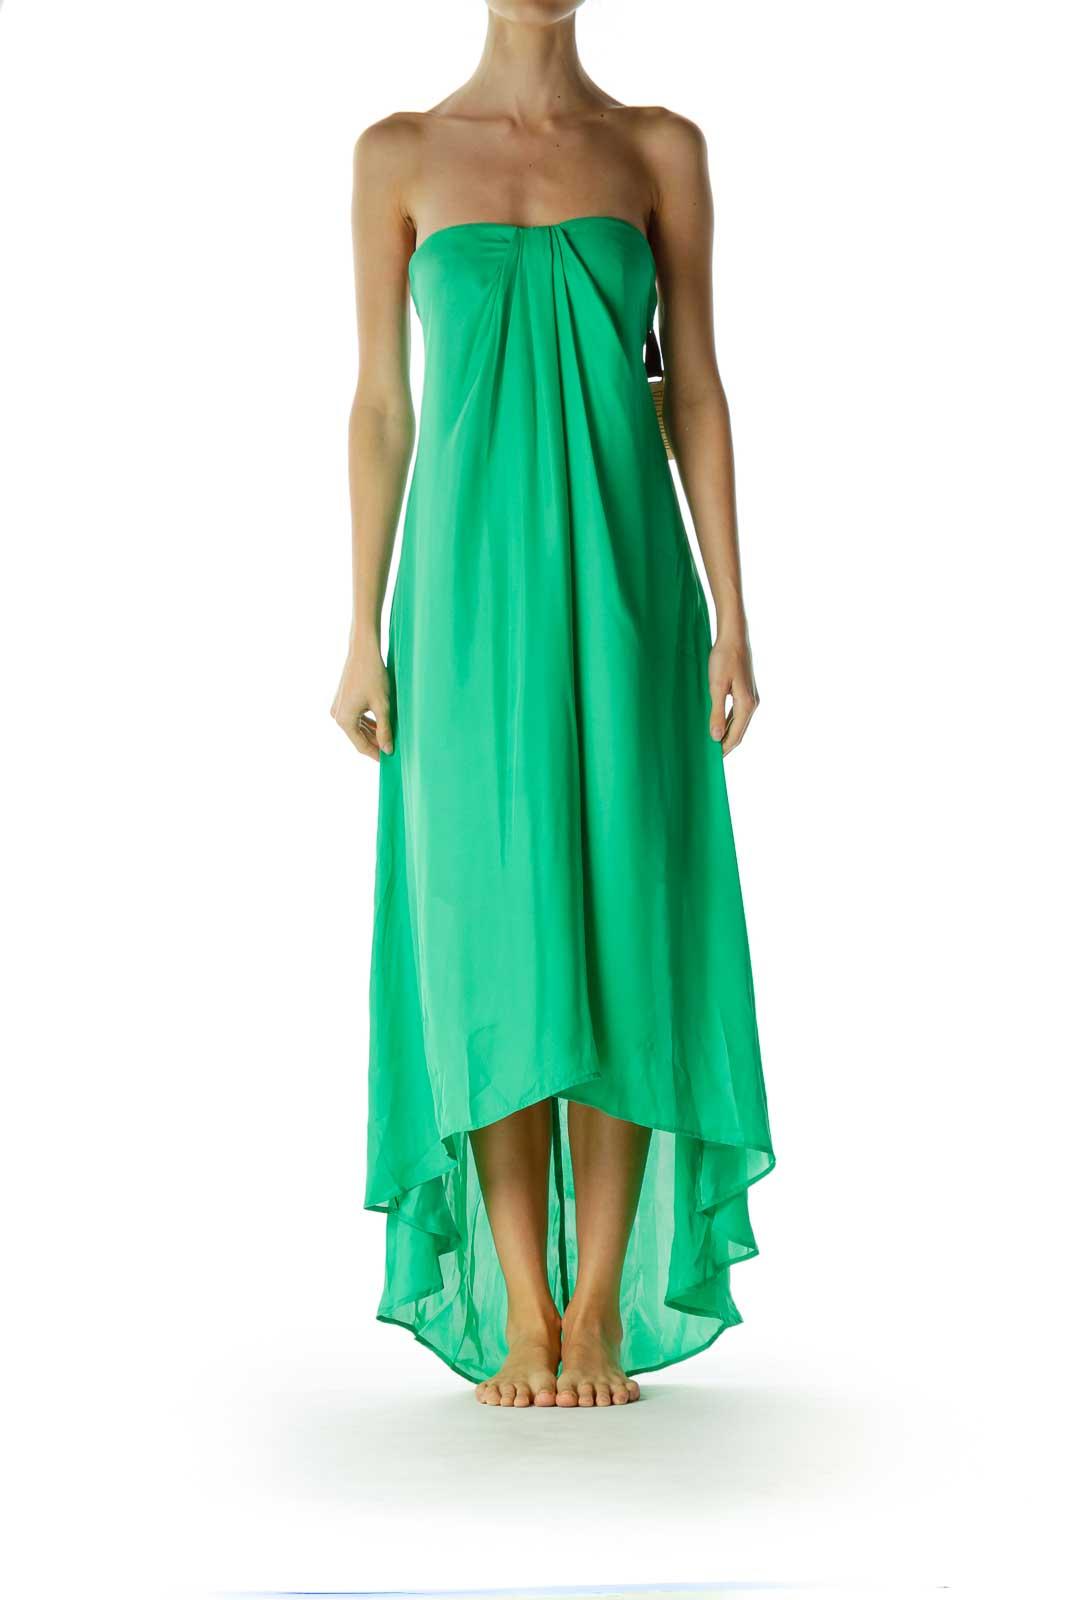 Green Strapless Maxi Dress Front